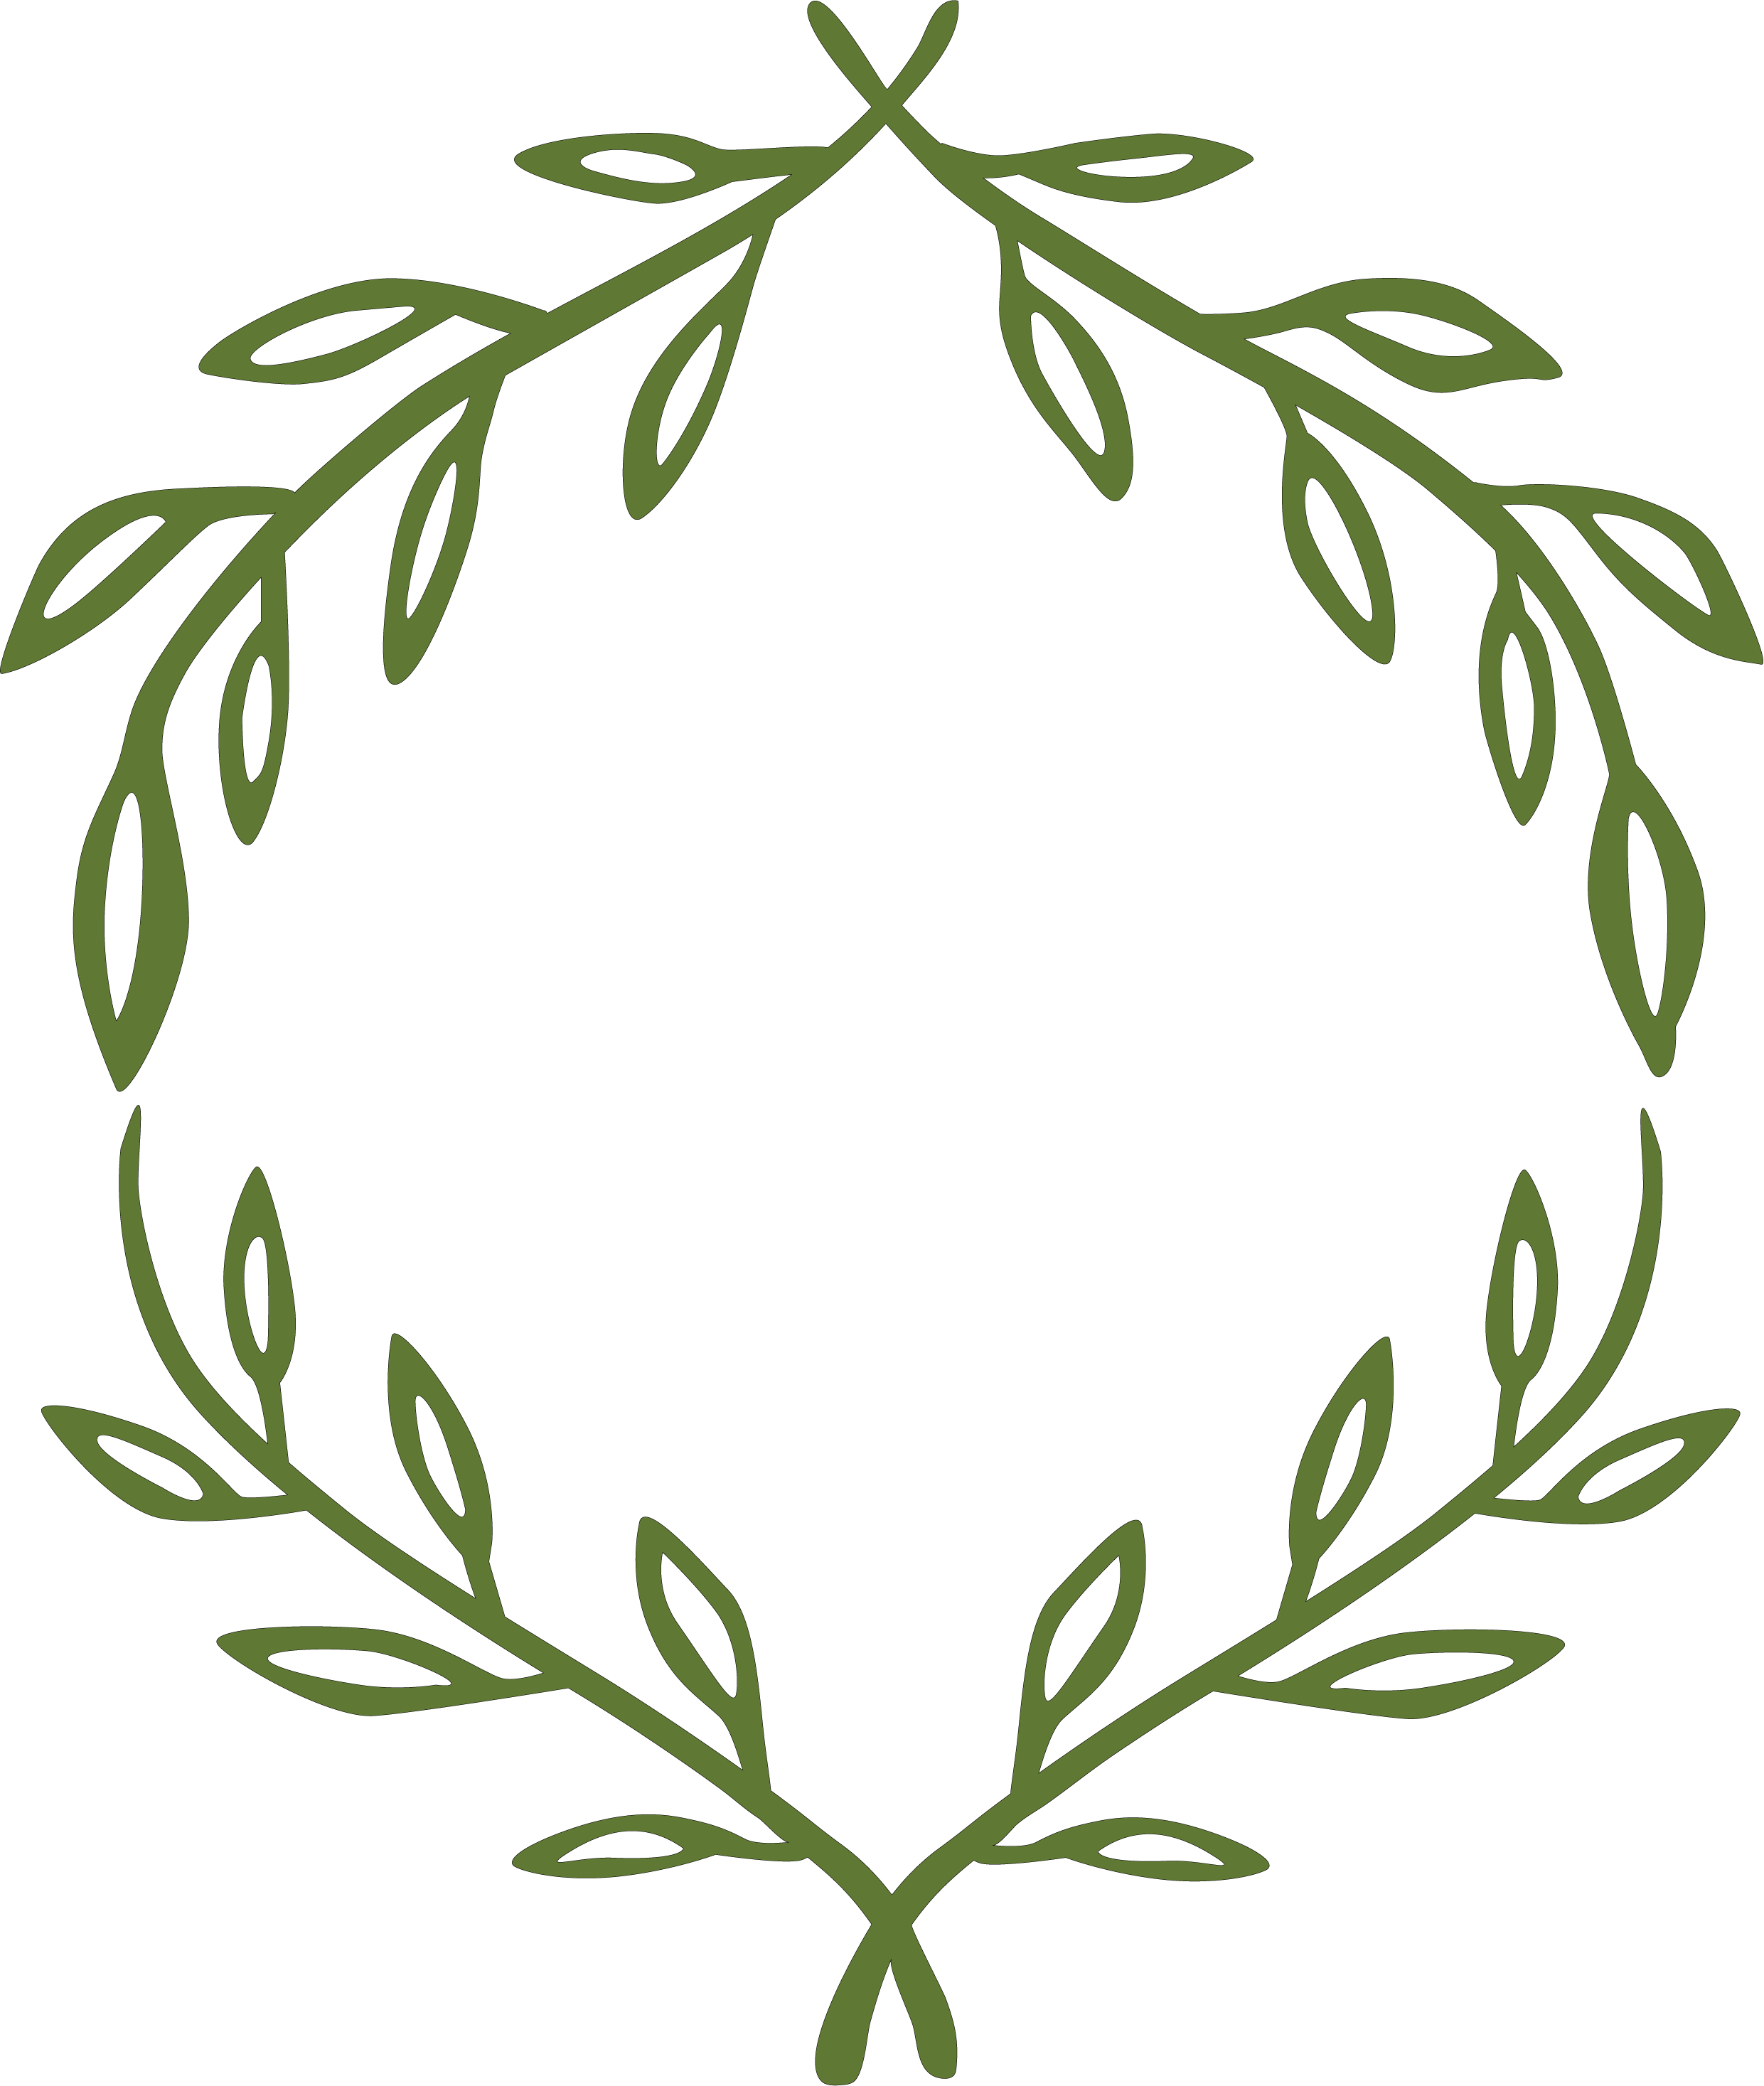 Leaves SVG Cut File